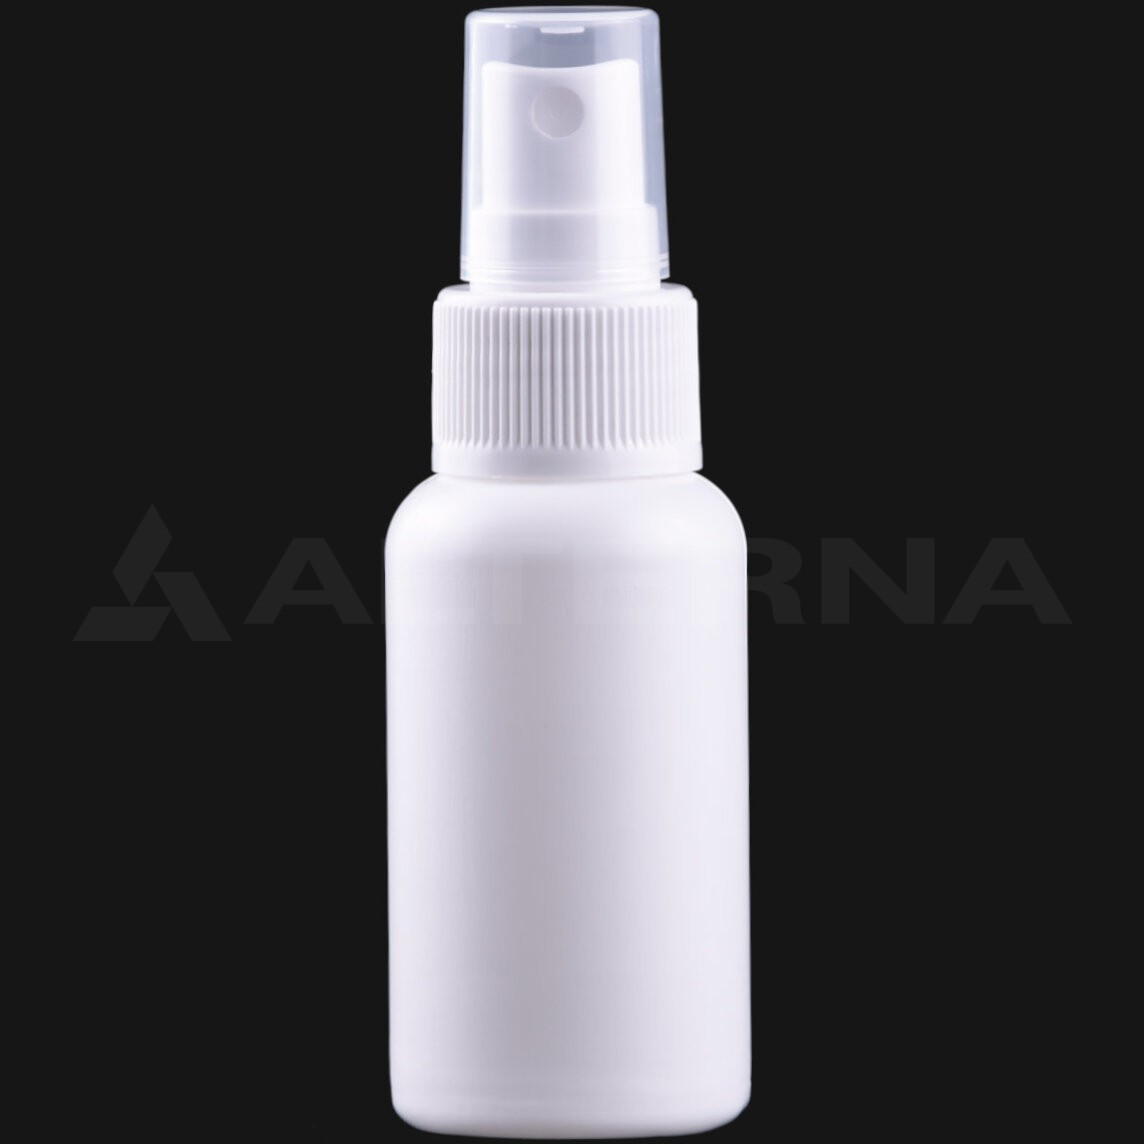 50 ml HDPE Bottle with 24 mm Sprayer